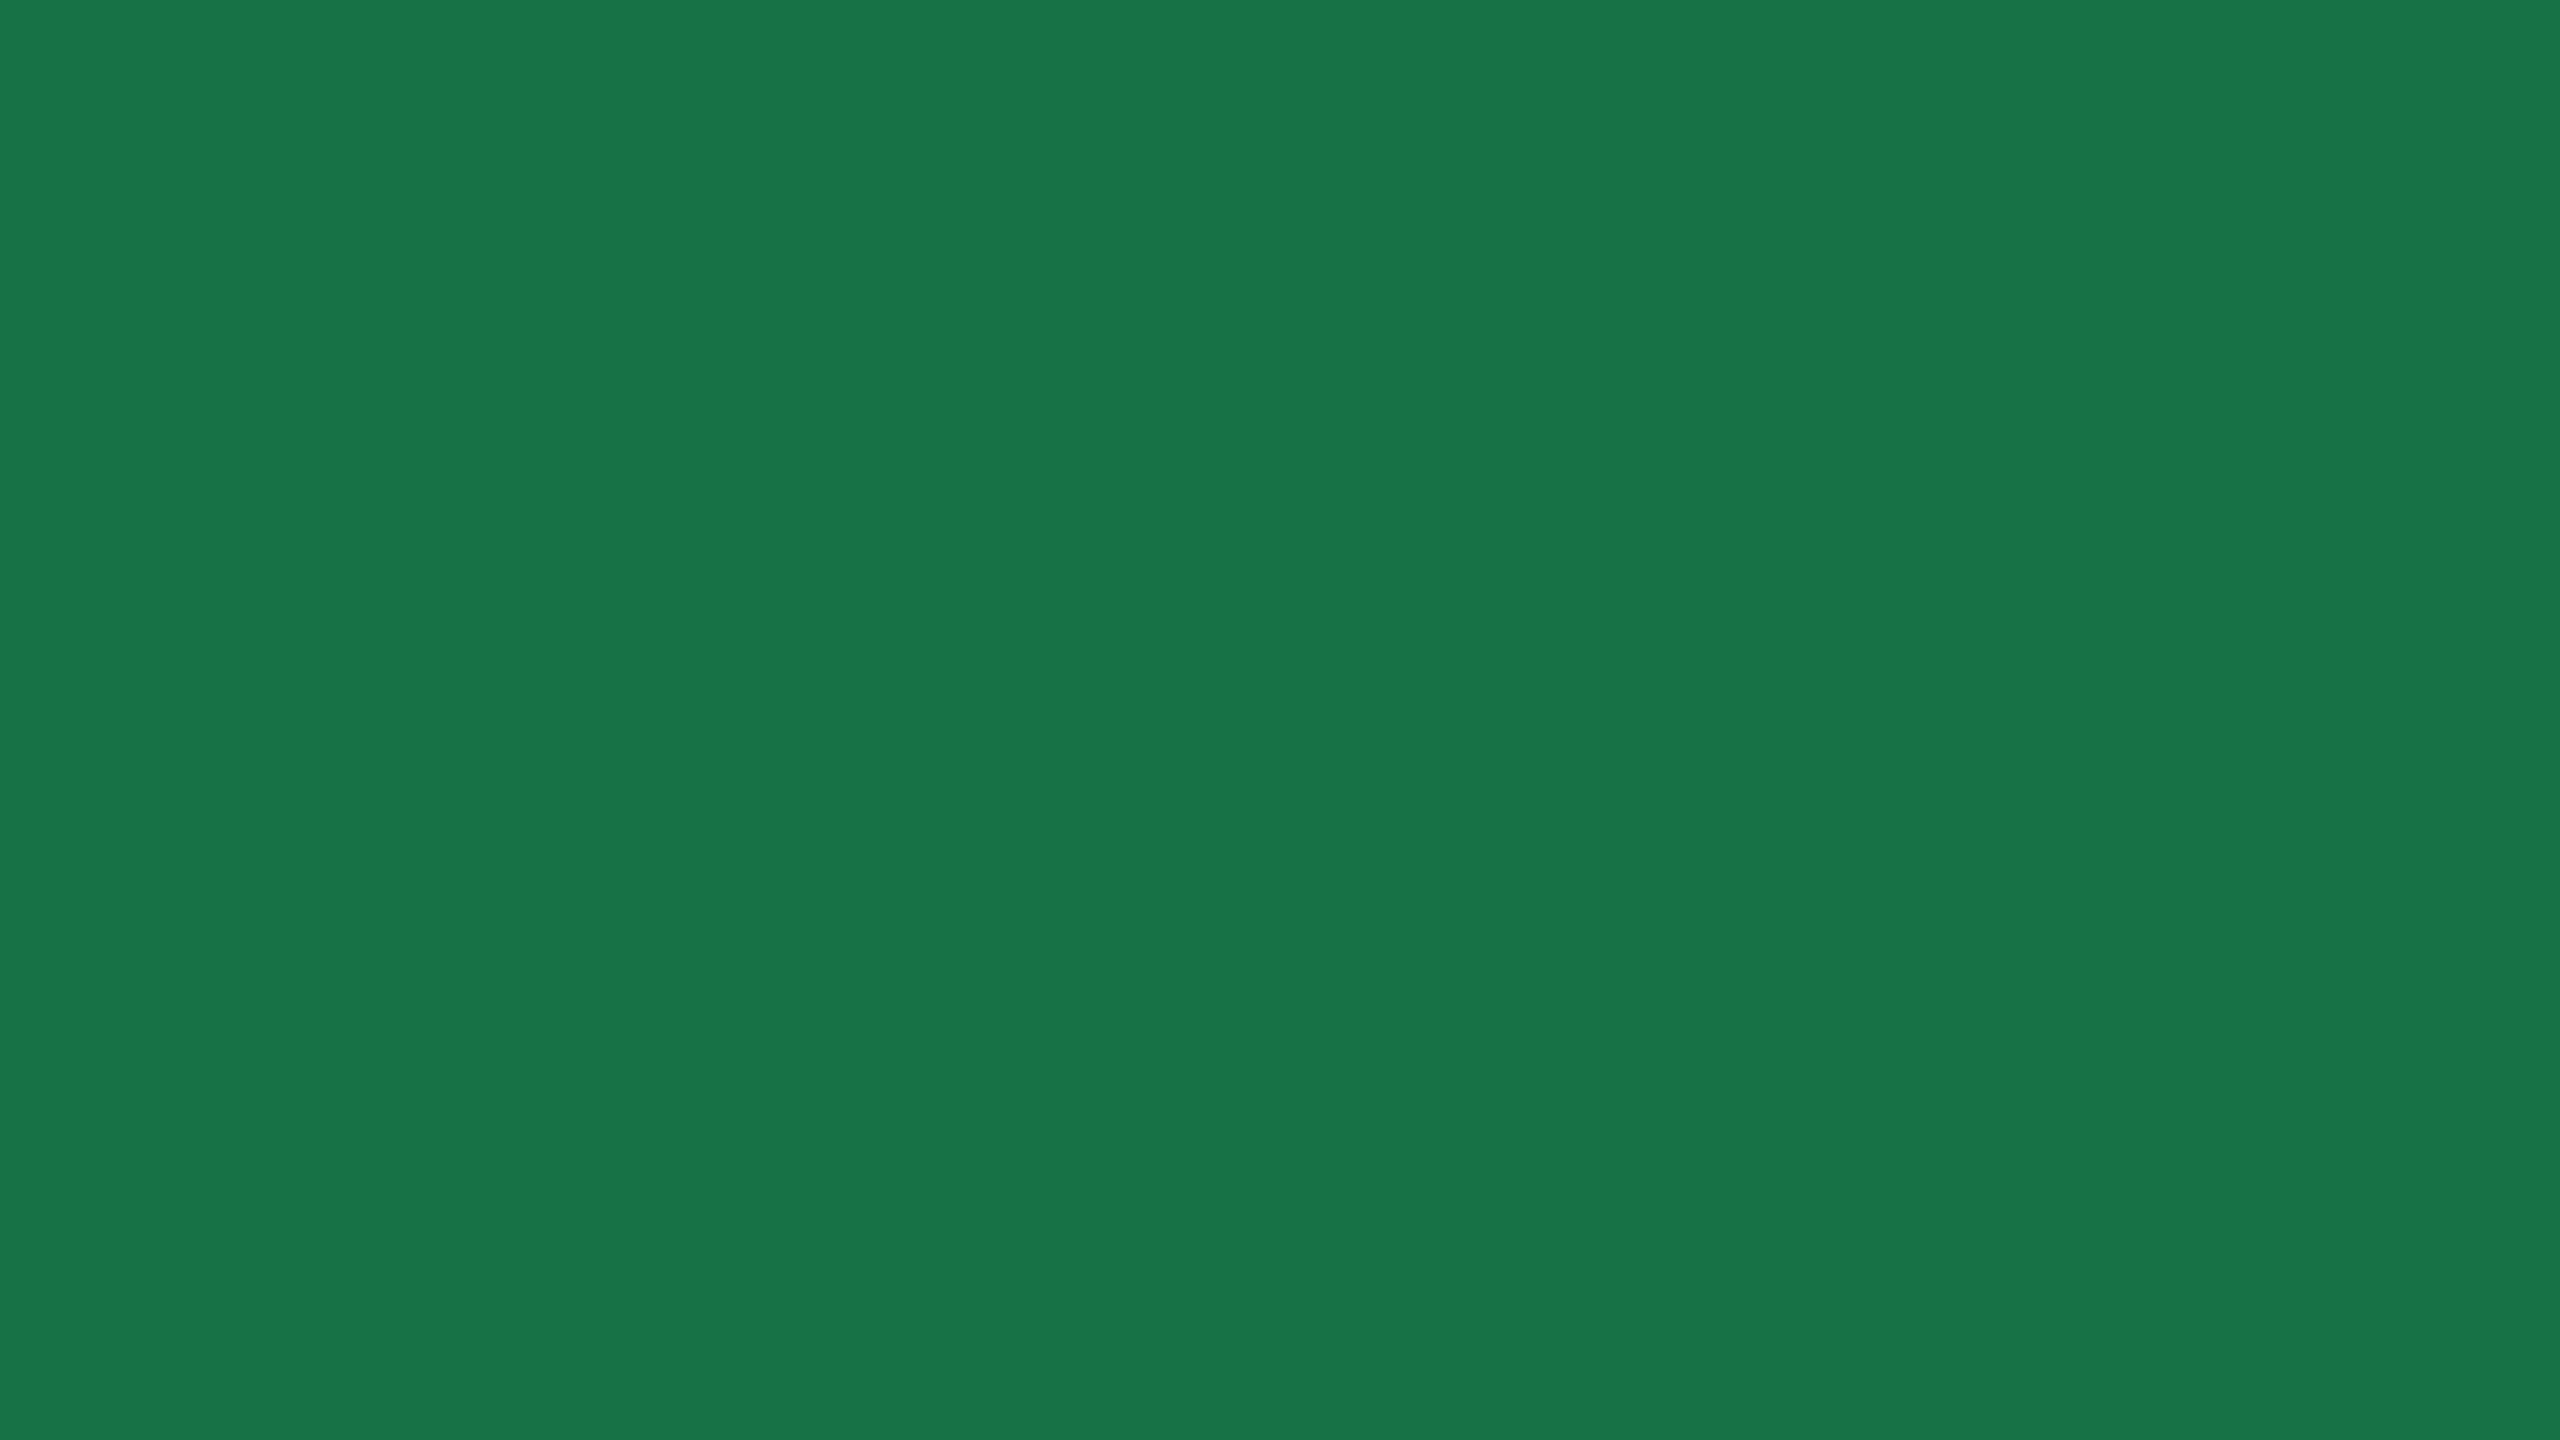 2560x1440 Dark Spring Green Solid Color Background